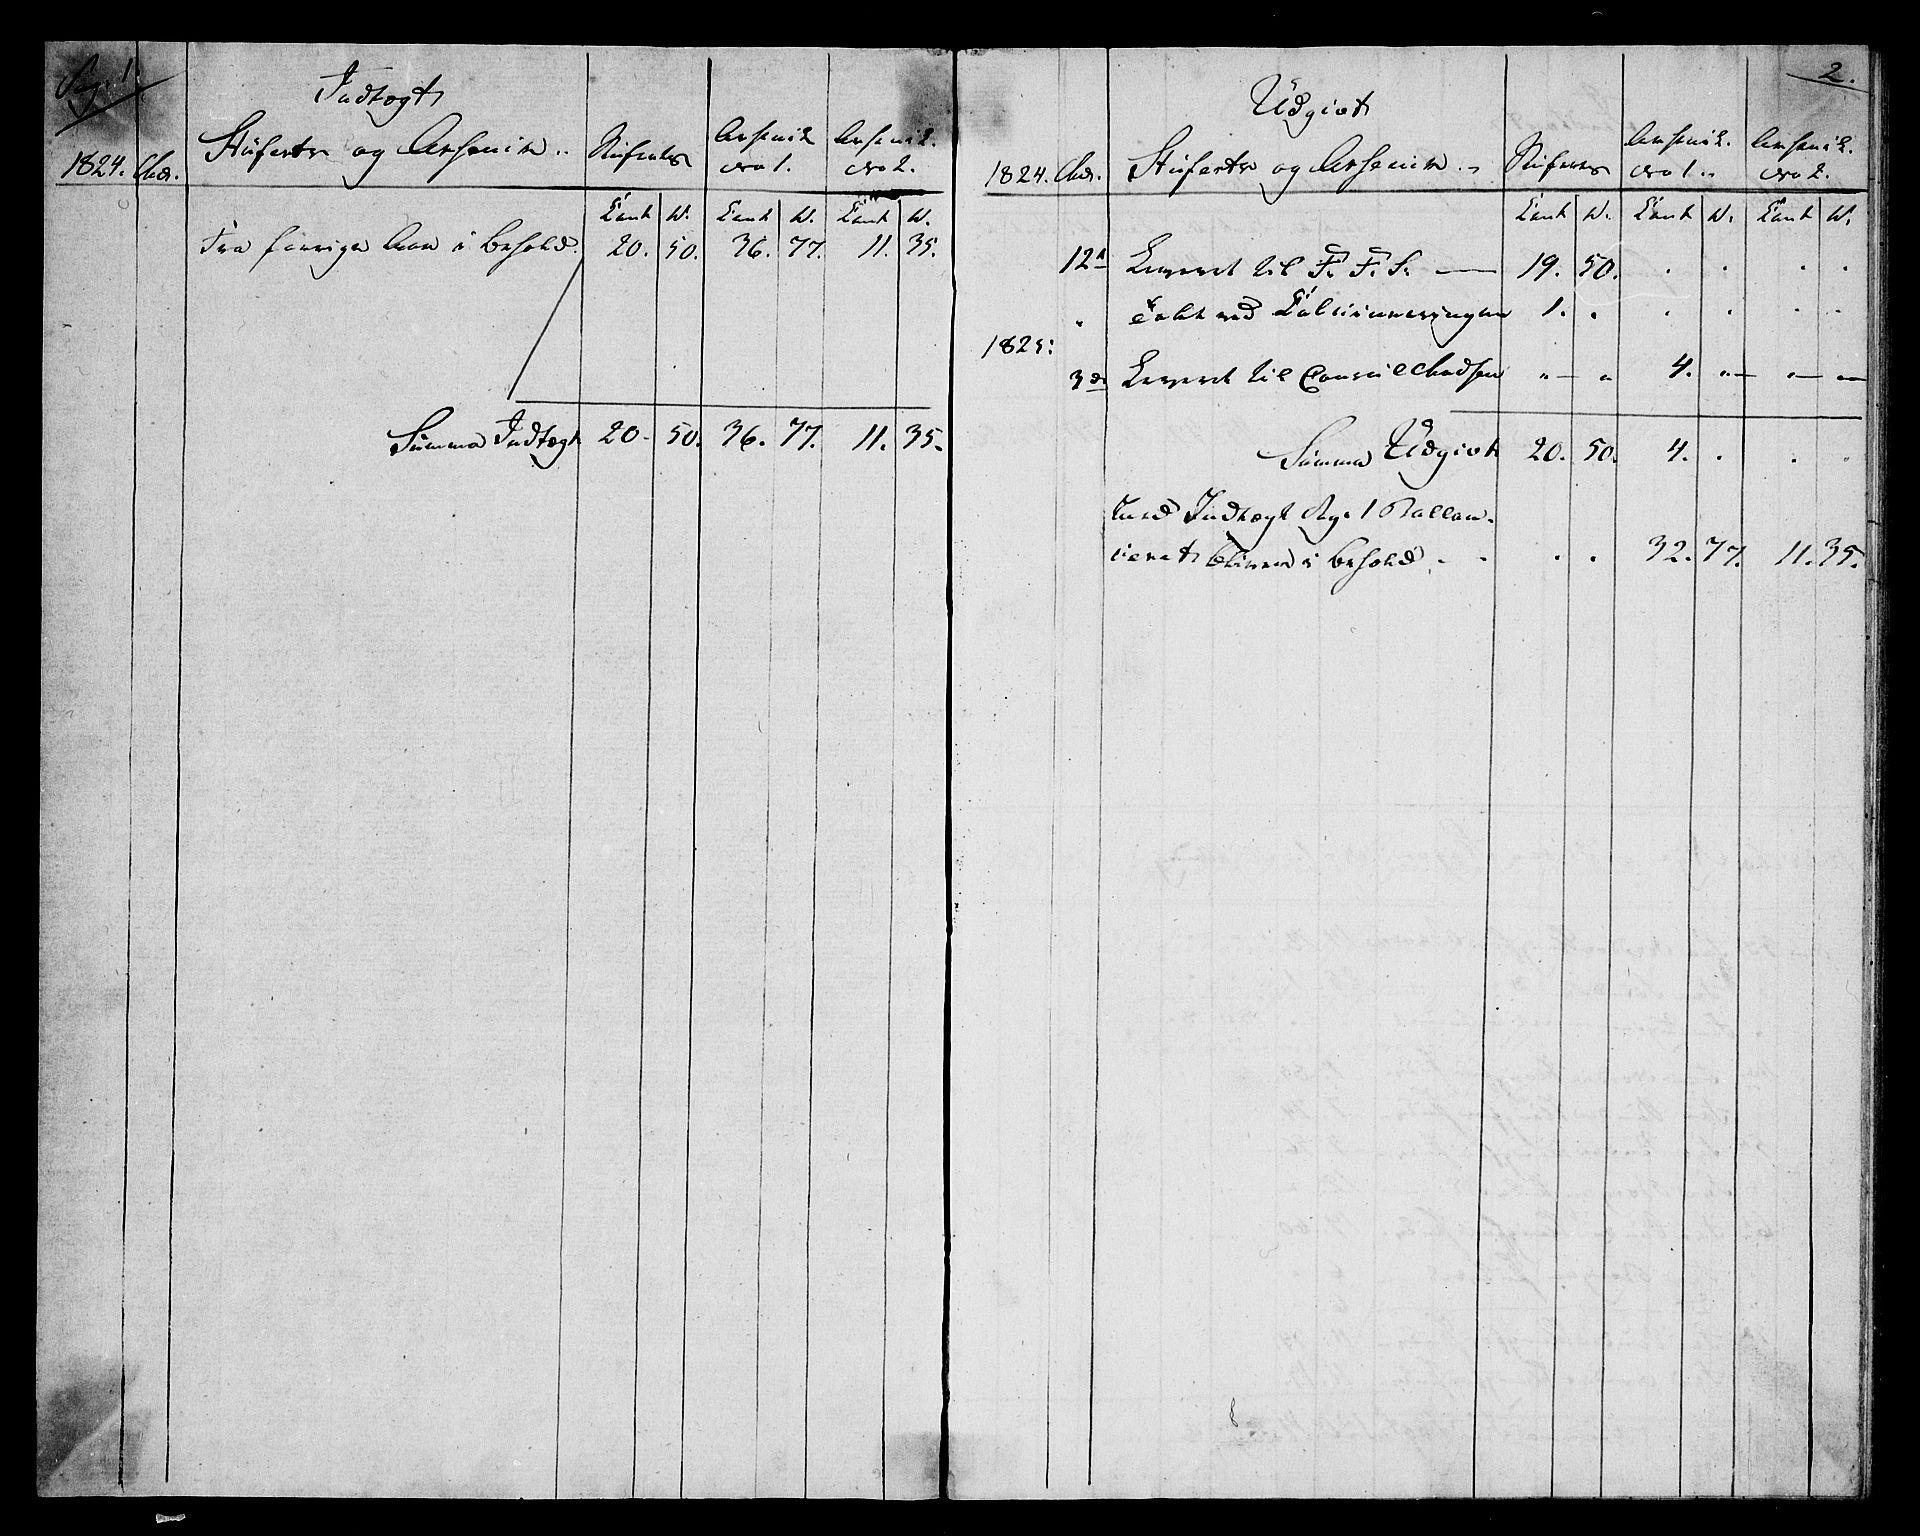 RA, Modums Blaafarveværk, G/Gd/Gdb/L0190: Materialhovedbok, 1824-1825, s. 2